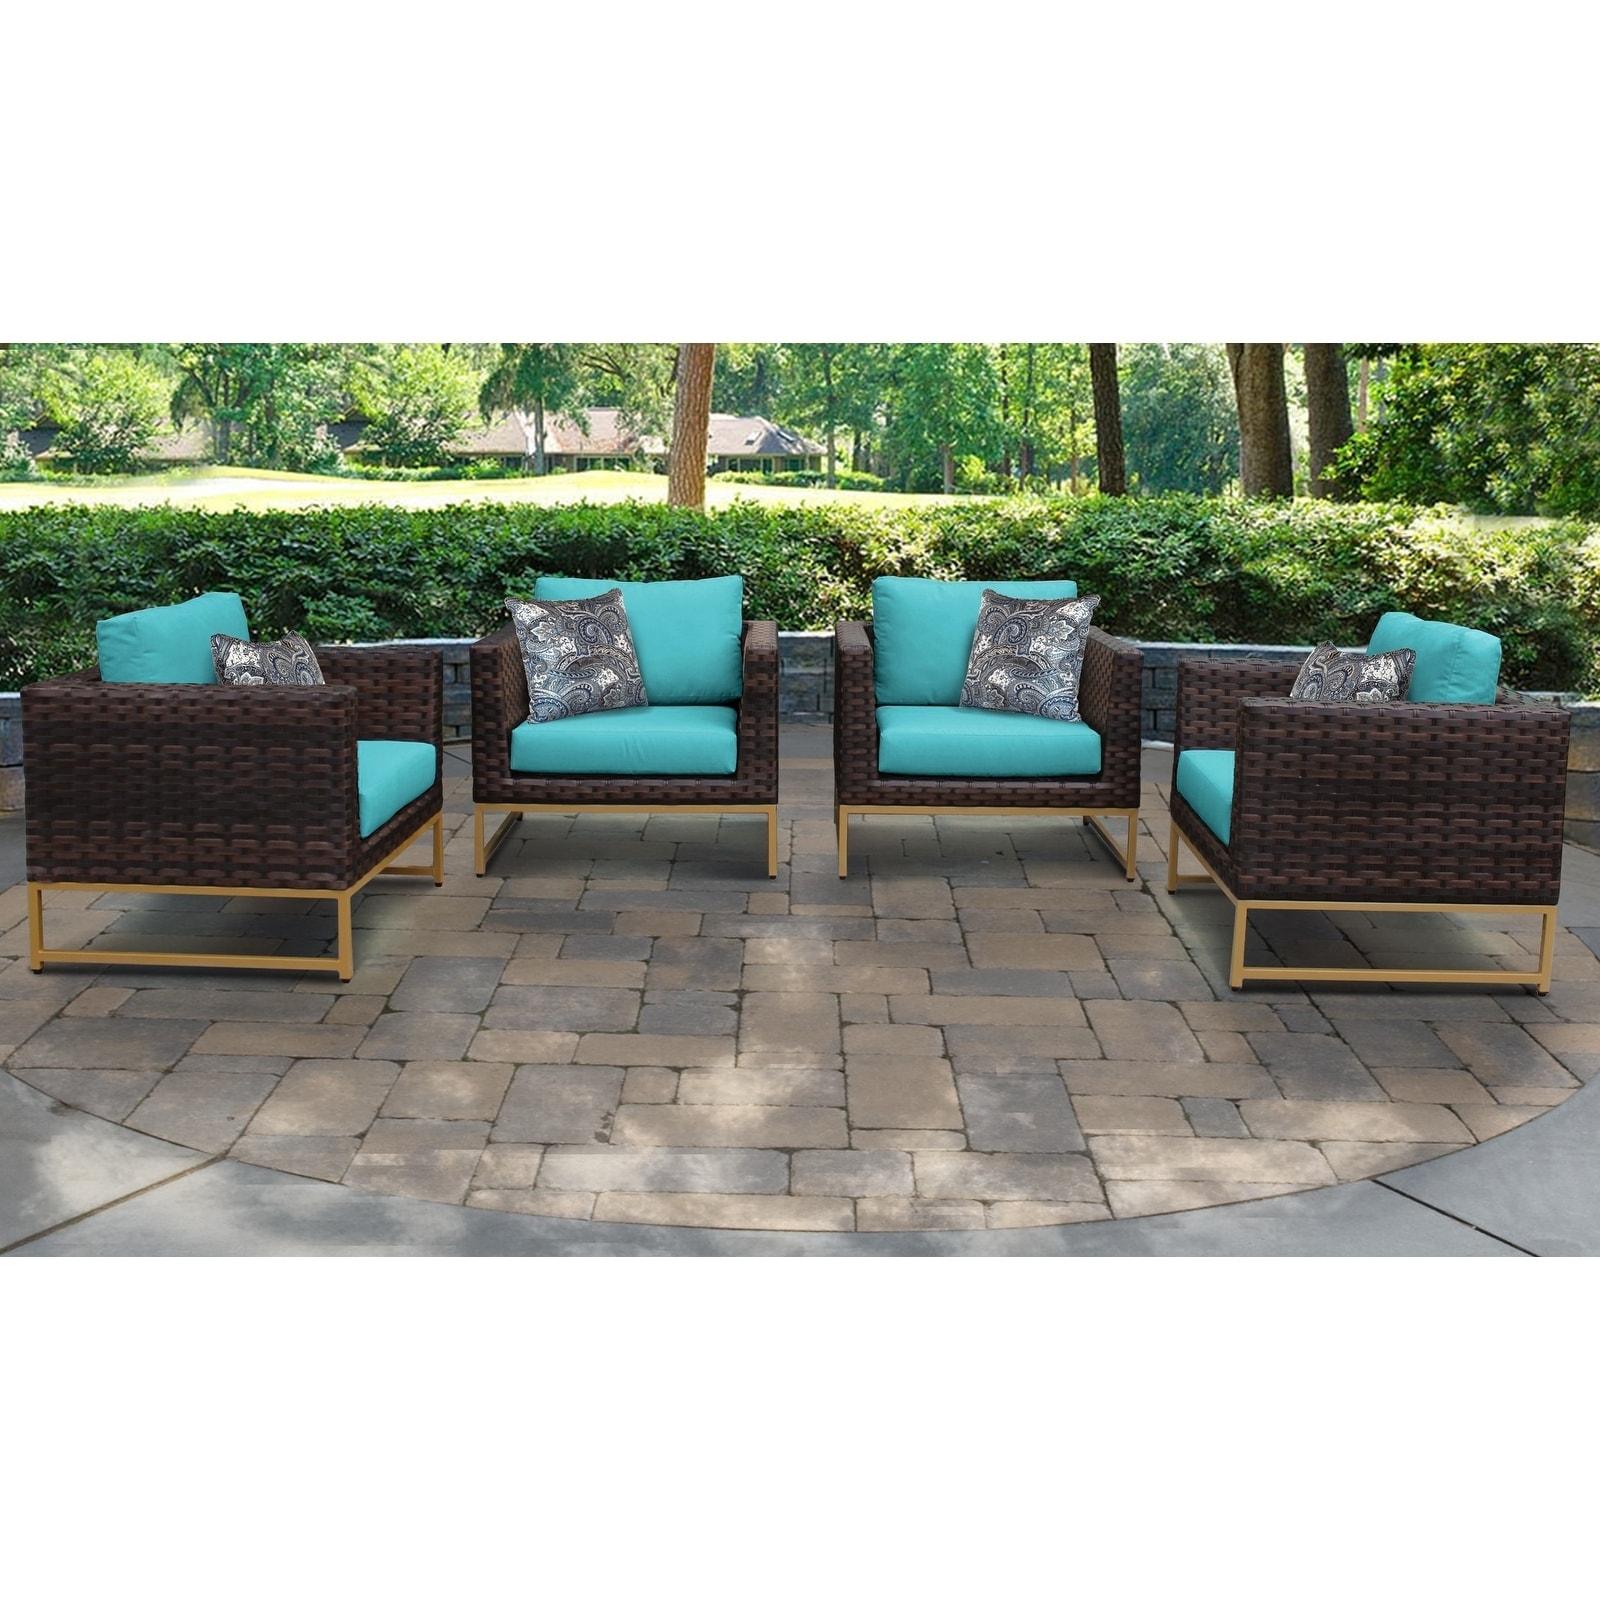 Outdoor Wicker Patio Furniture Set 04g